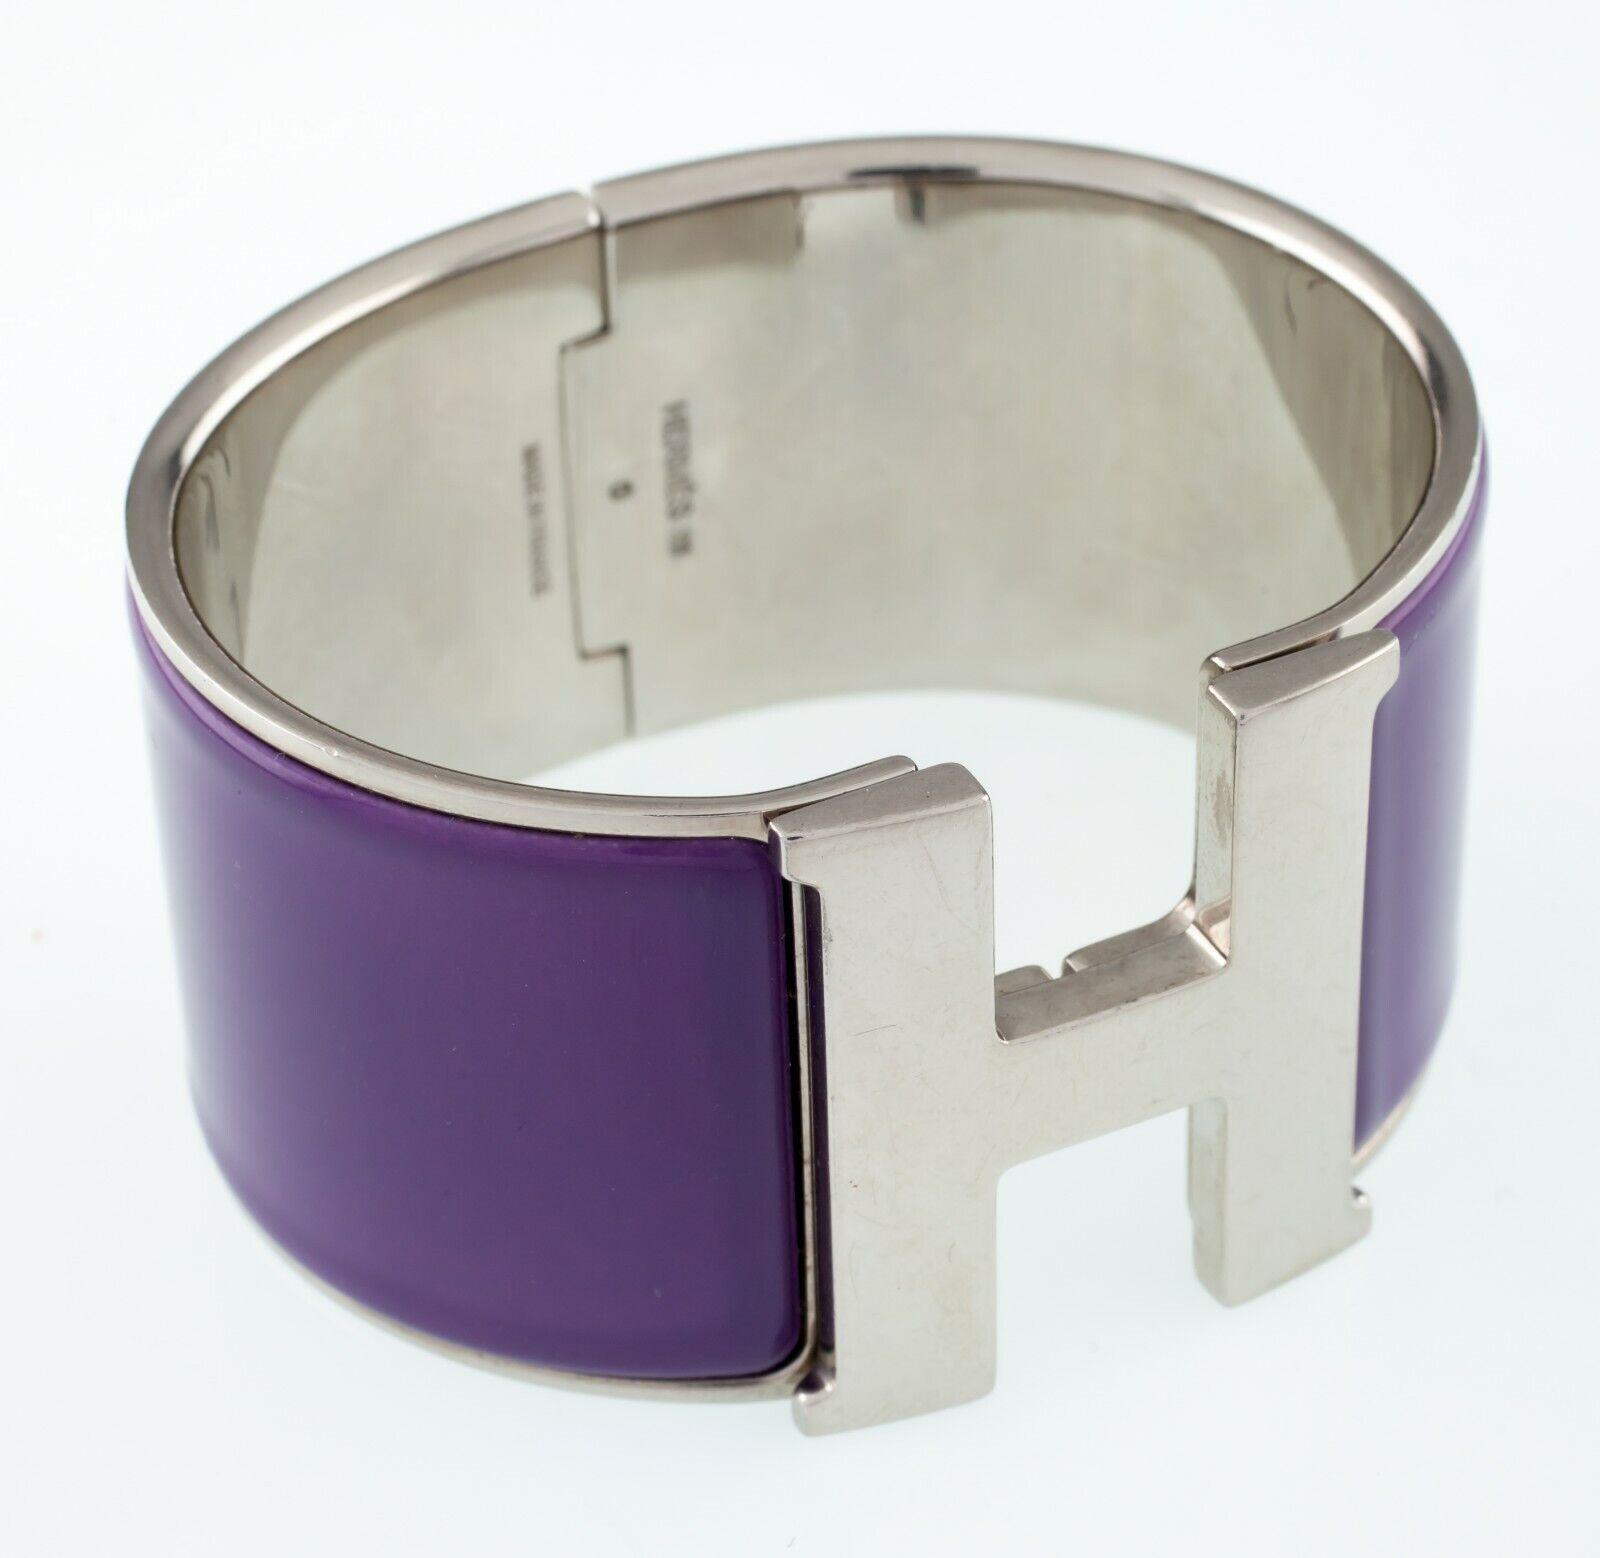 Hermes clic clac violet extra large bracelet joli